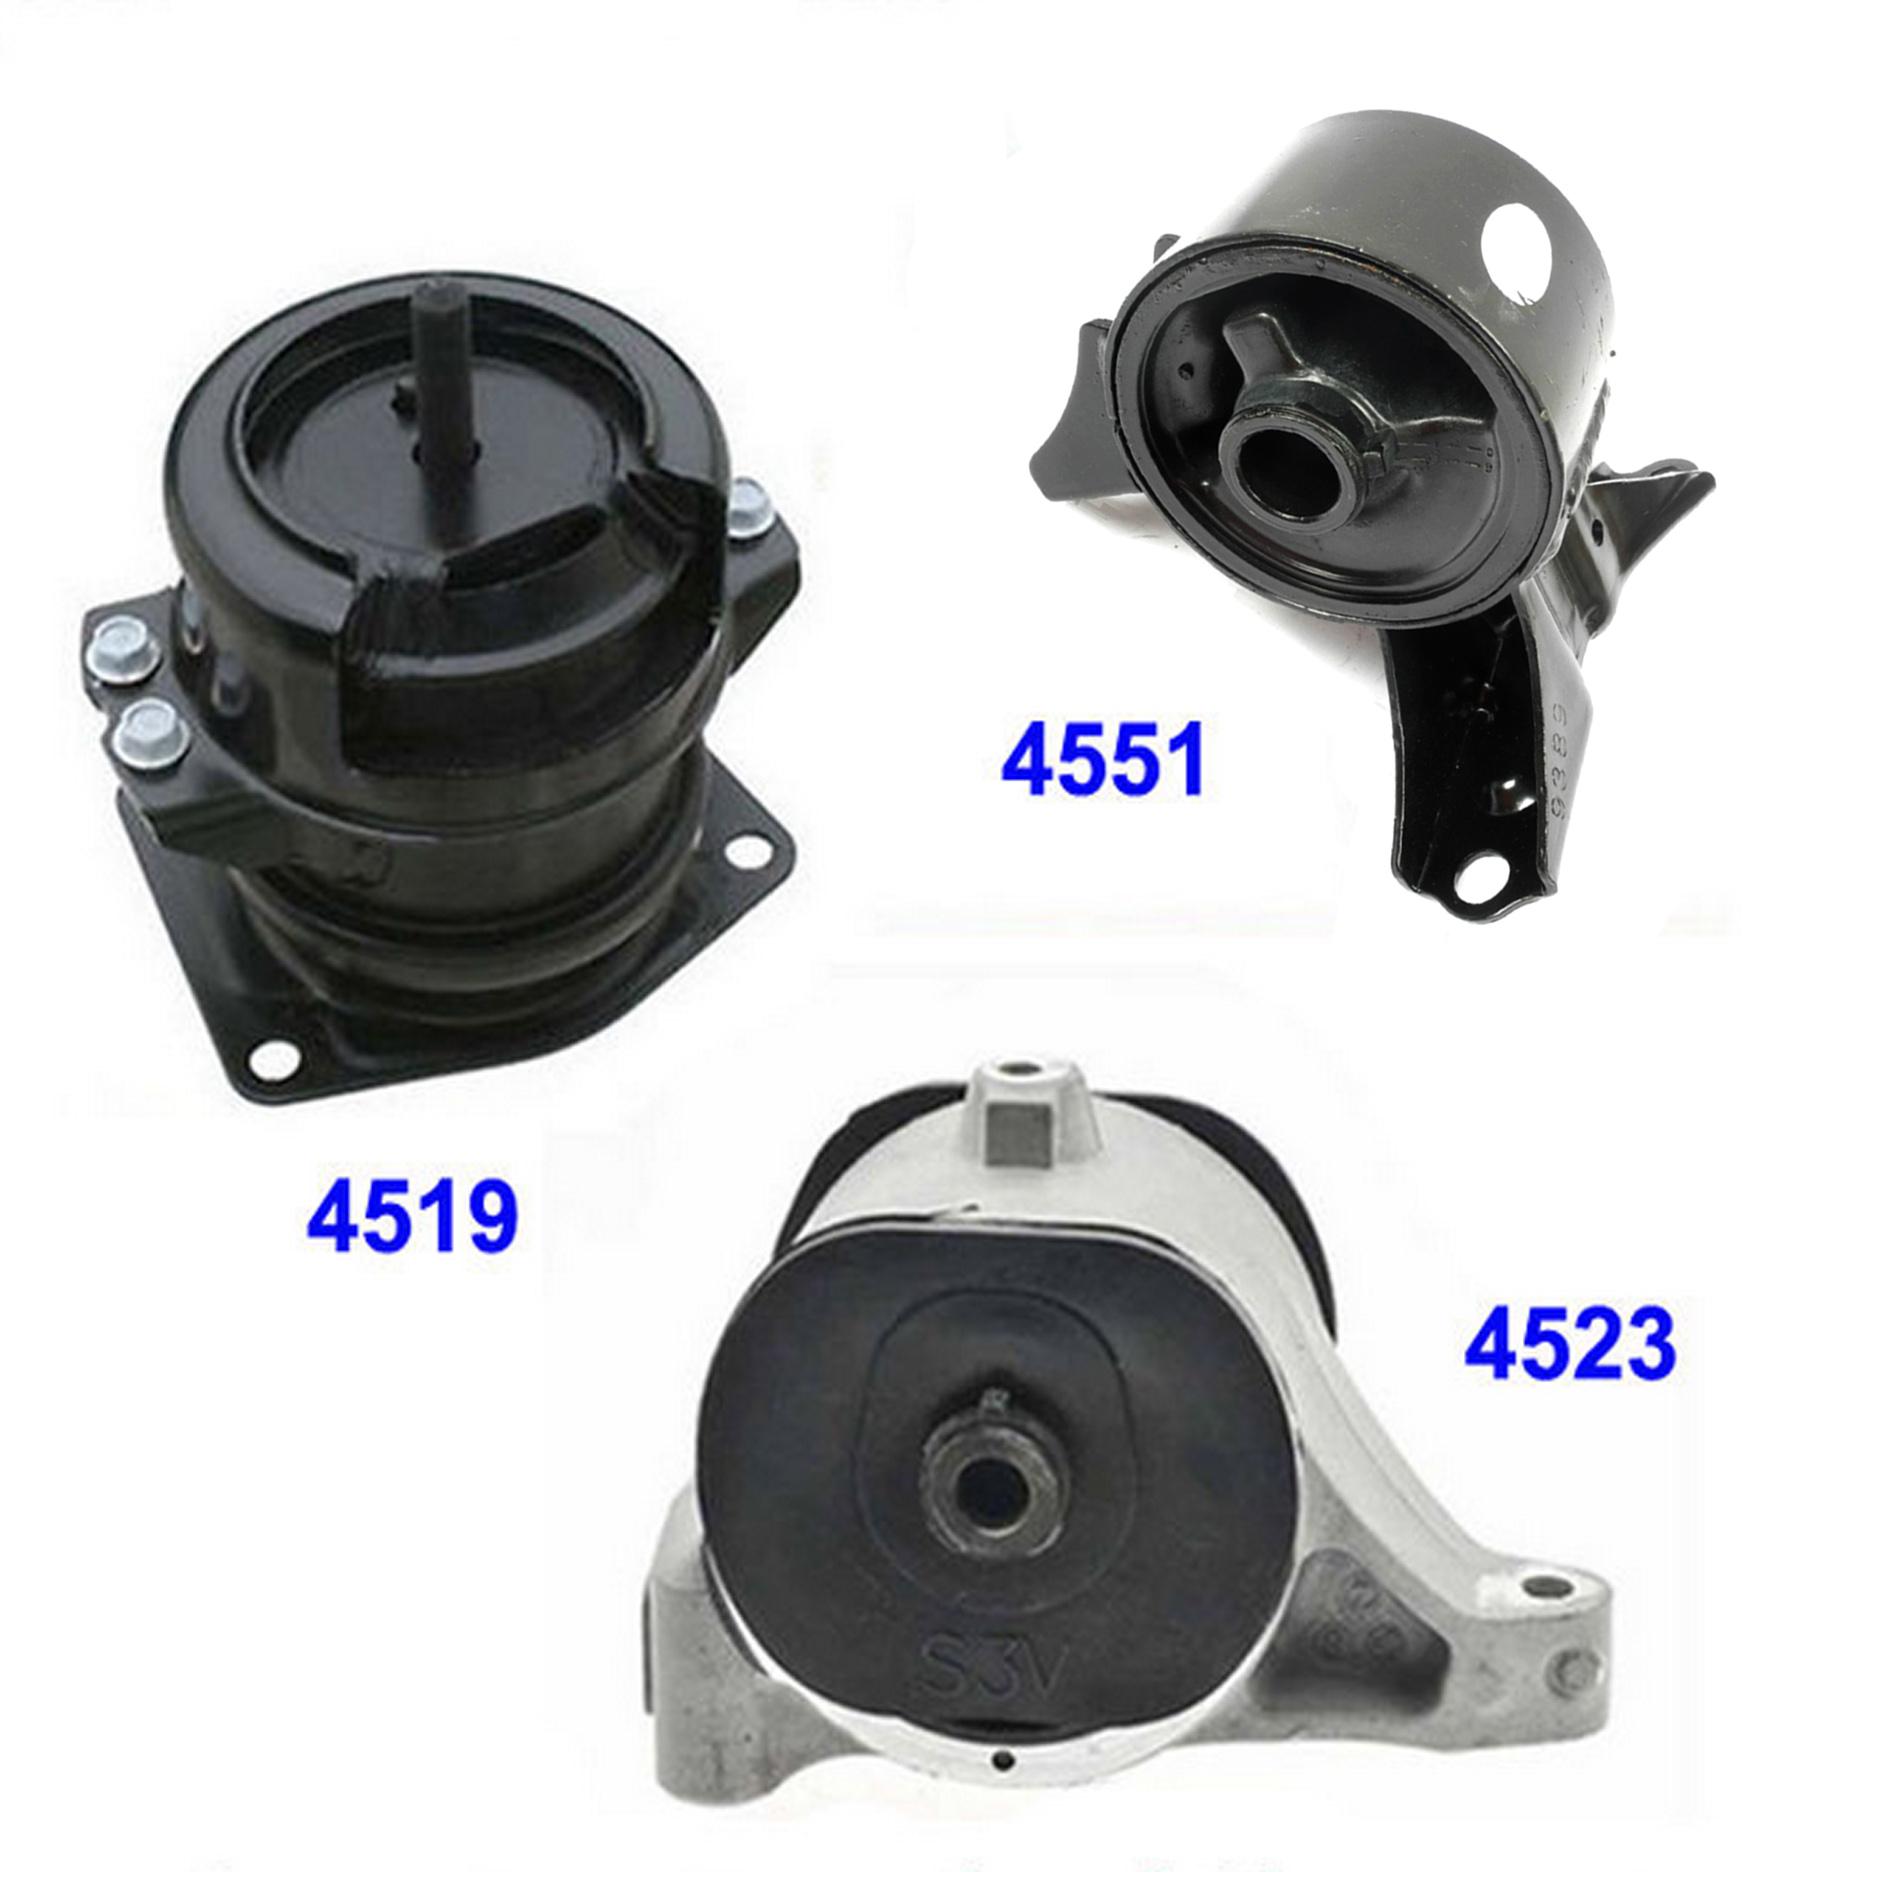 For 2001-2006 Acura MDX// Honda Pilot 3.5L Engine Motor Mount Set 3PCS M500